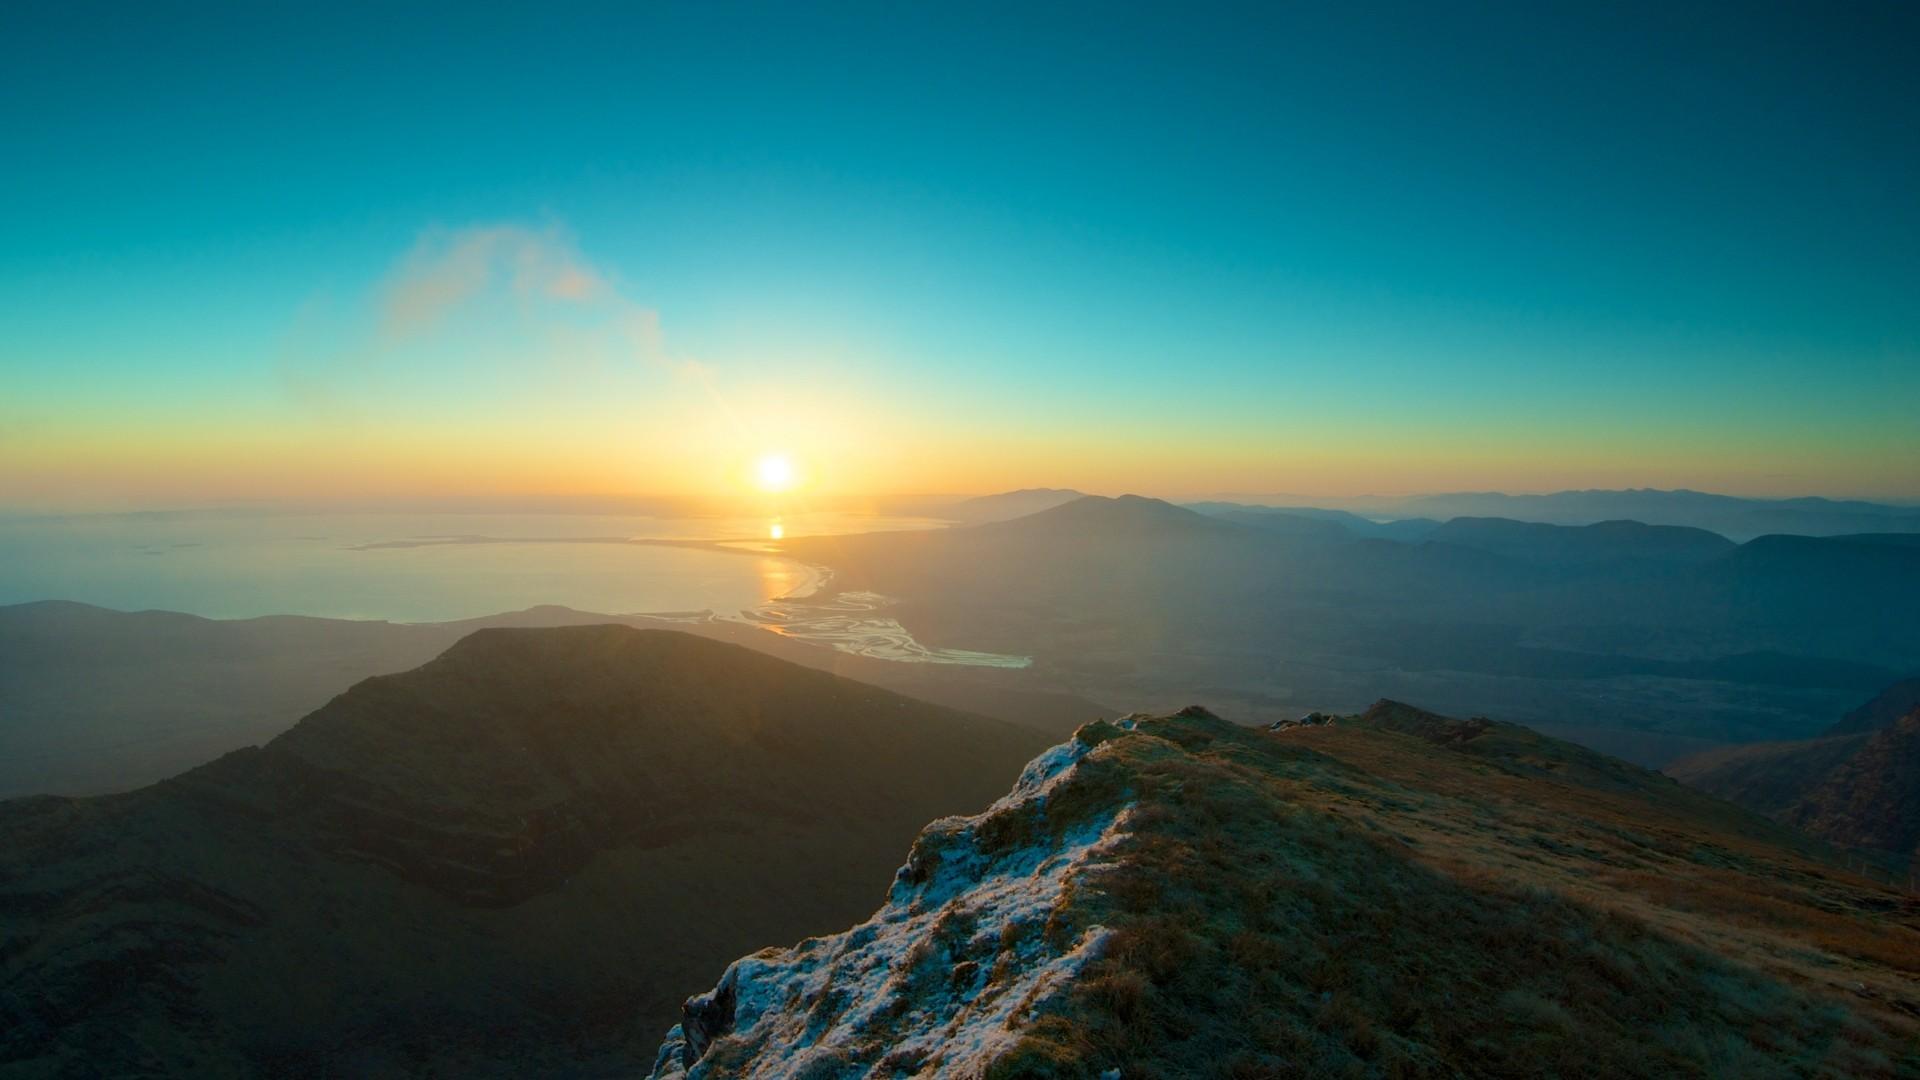 … Background Full HD 1080p. Wallpaper mountains, sky, sunset,  peaks